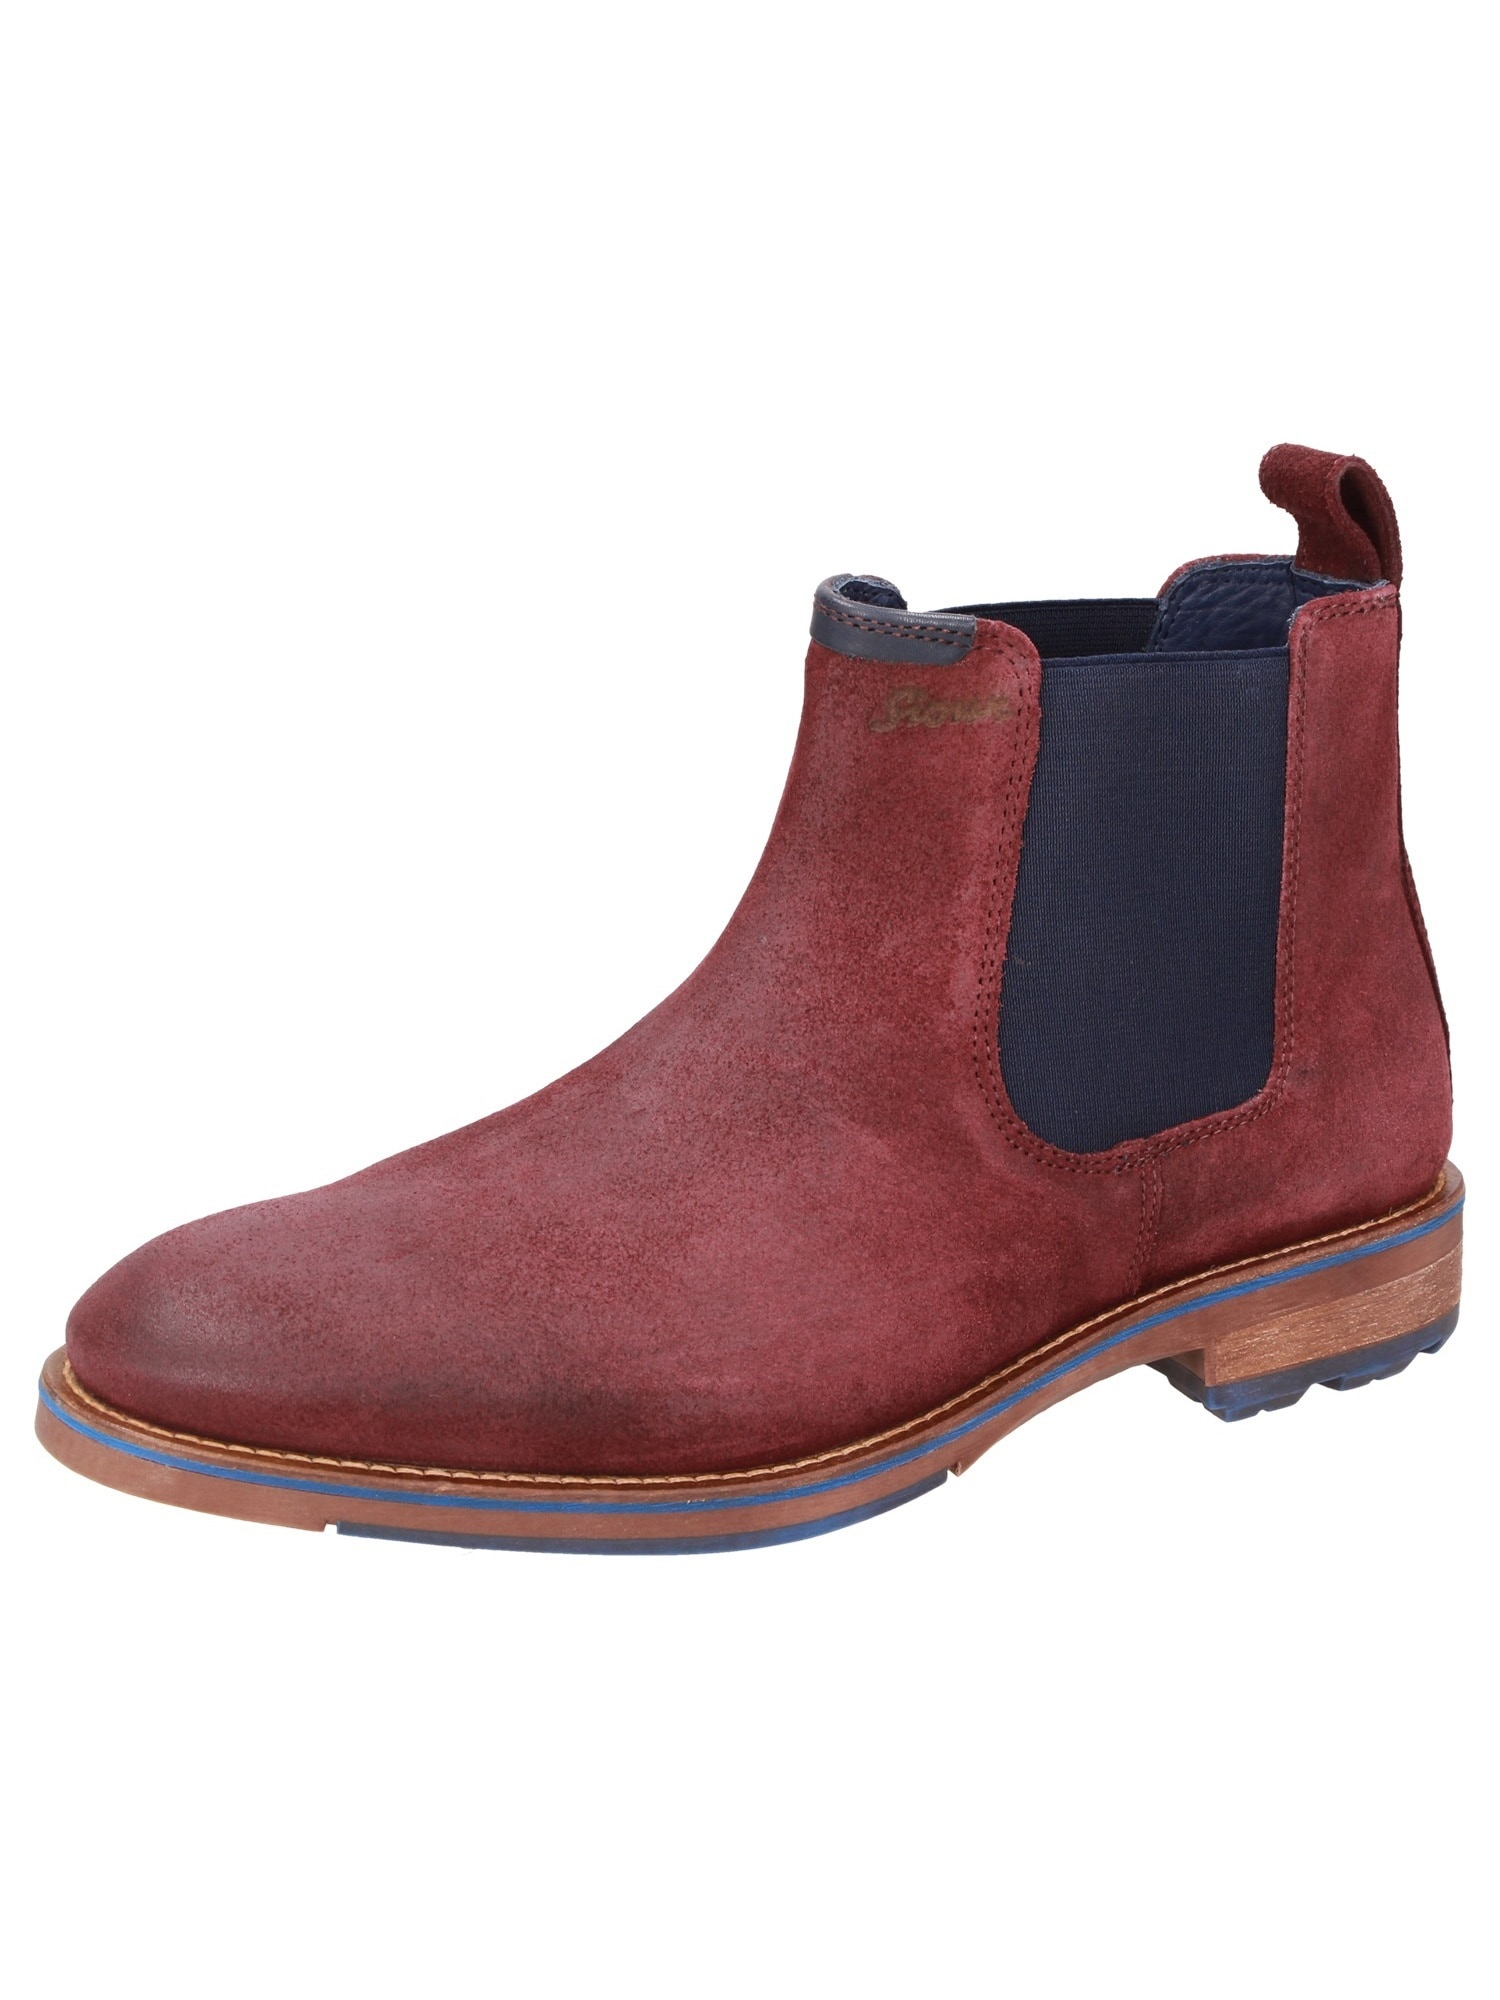 Stiefelette 'Artemino-701'   Schuhe > Boots > Stiefel   SIOUX